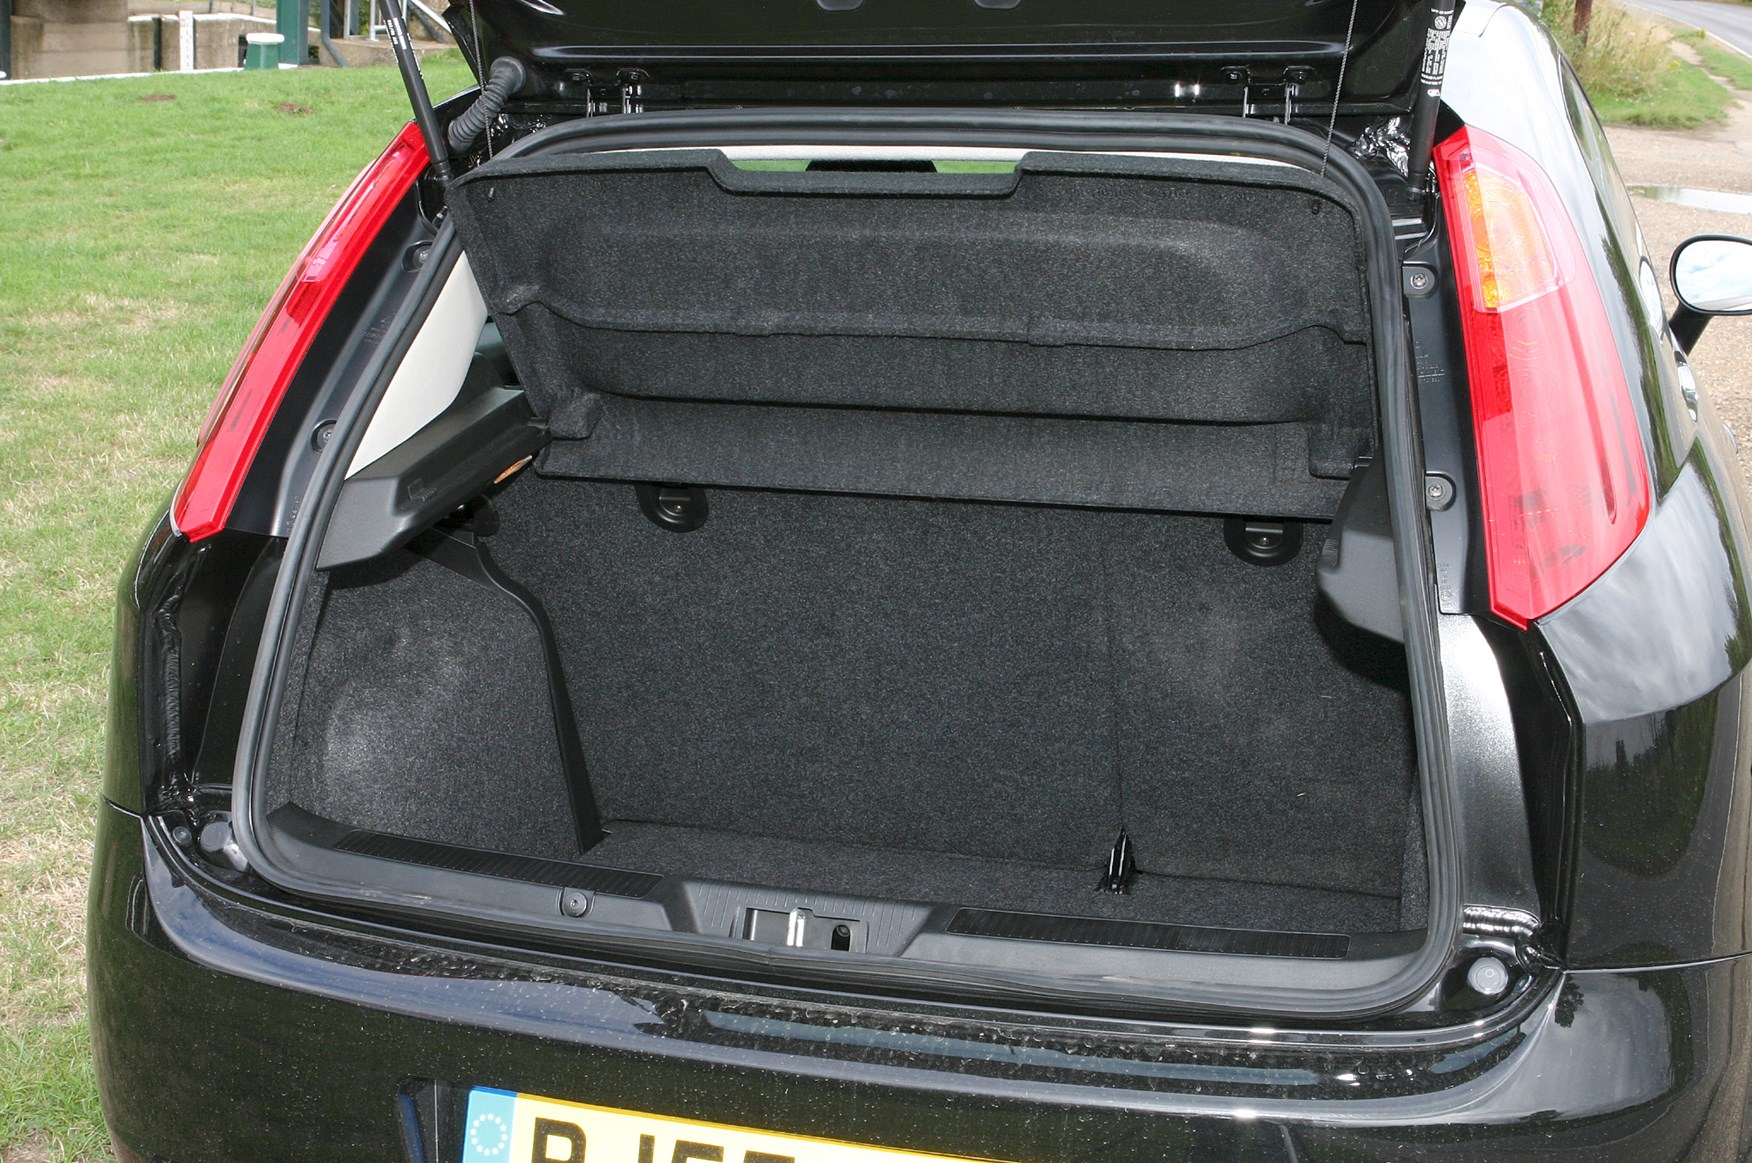 Fiat Punto Hatchback (2003 - 2006) Features, Equipment and ... on jeep patriot price, mazda mx5 price, fiat multipla price, peugeot 206 price, nissan cube price, fiat mini price, fiat 500x price, fiat abarth price, toyota yaris price, honda jazz price, volkswagen jetta price, nissan altima price, audi s6 price, fiat 500 price, mitsubishi lancer price, ferrari 599 gtb fiorano price, dacia sandero price, ford fusion price, fiat cars, fiat sticker prices,